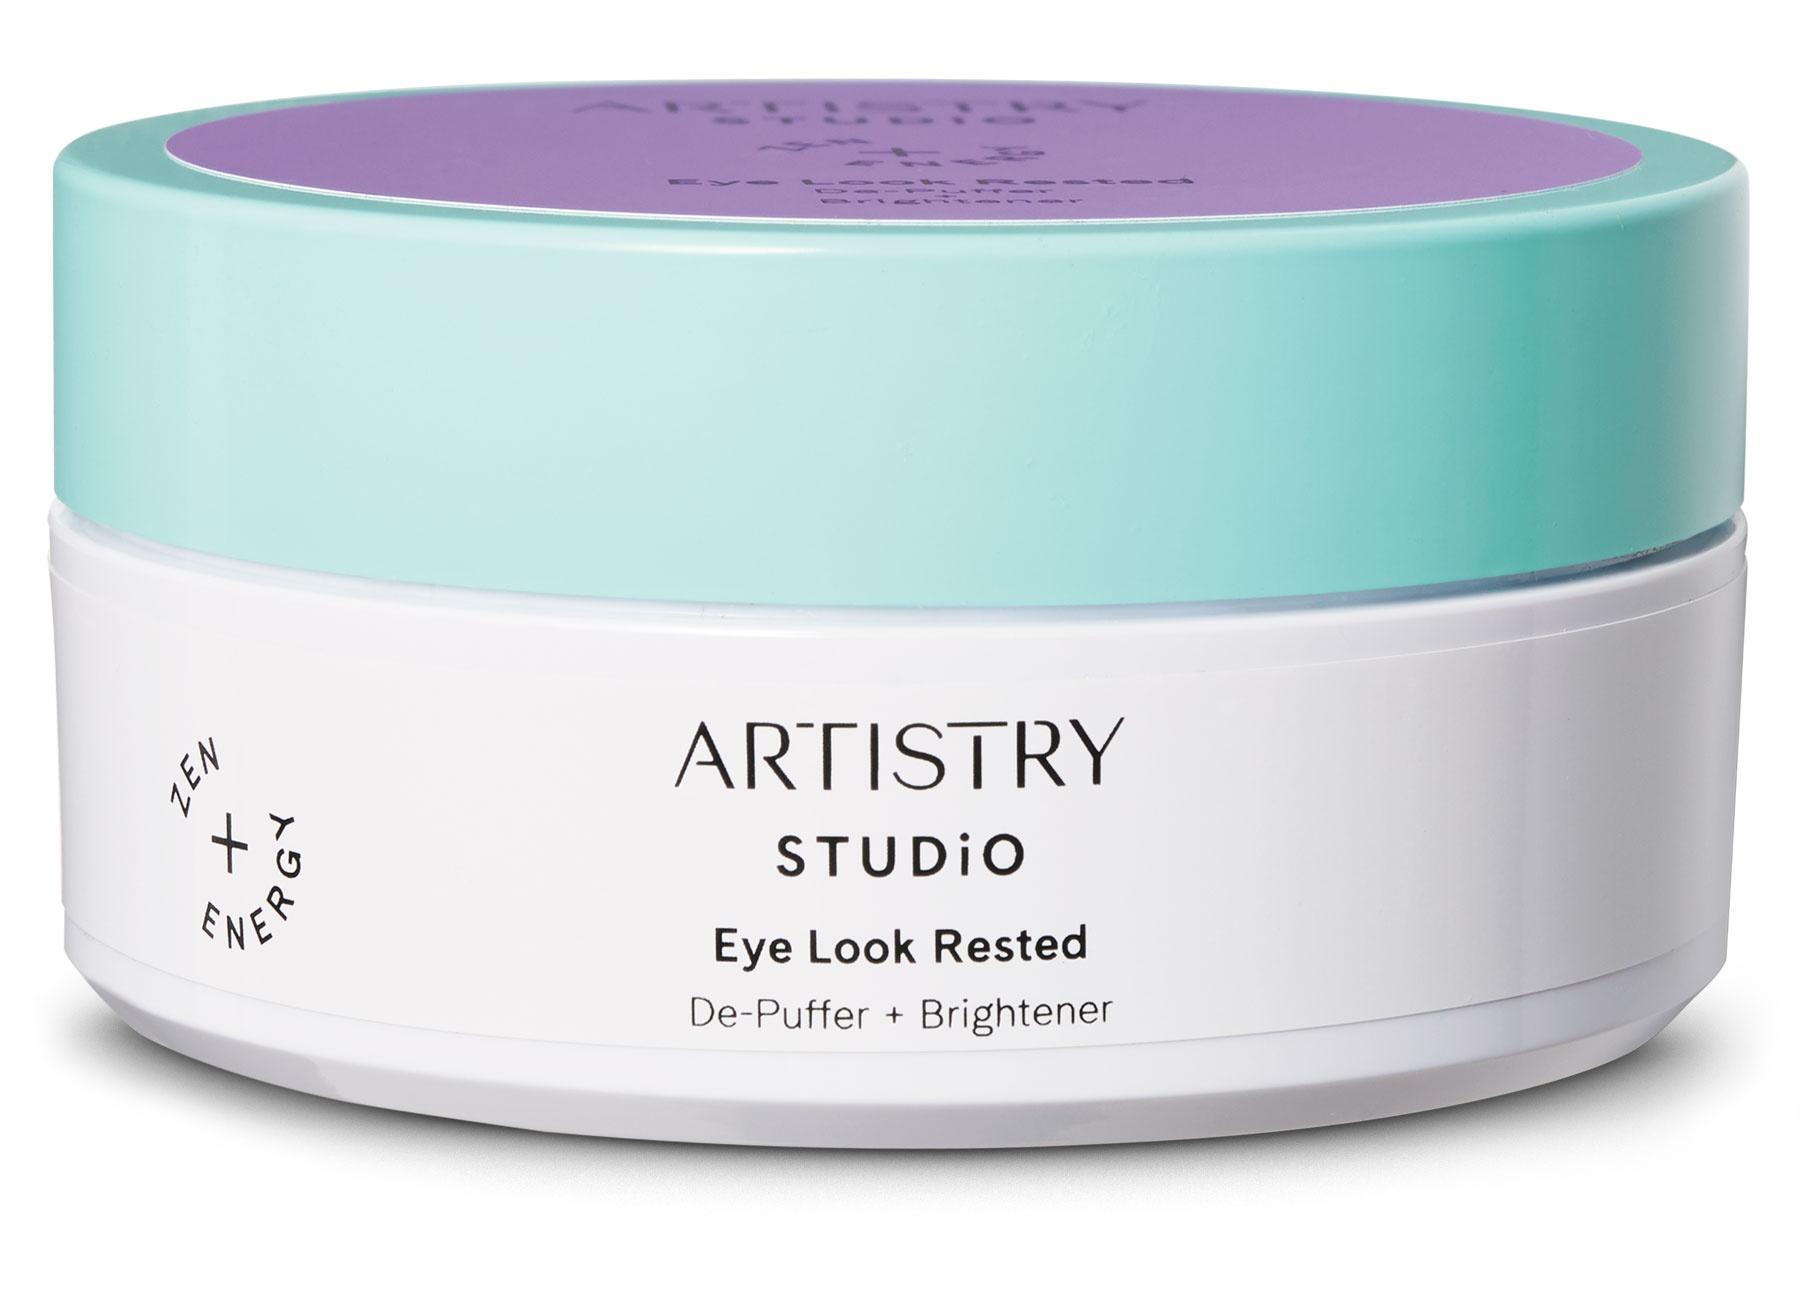 Amway Artistry Studio™ Eye Look Rested De-Puffer + Brightener